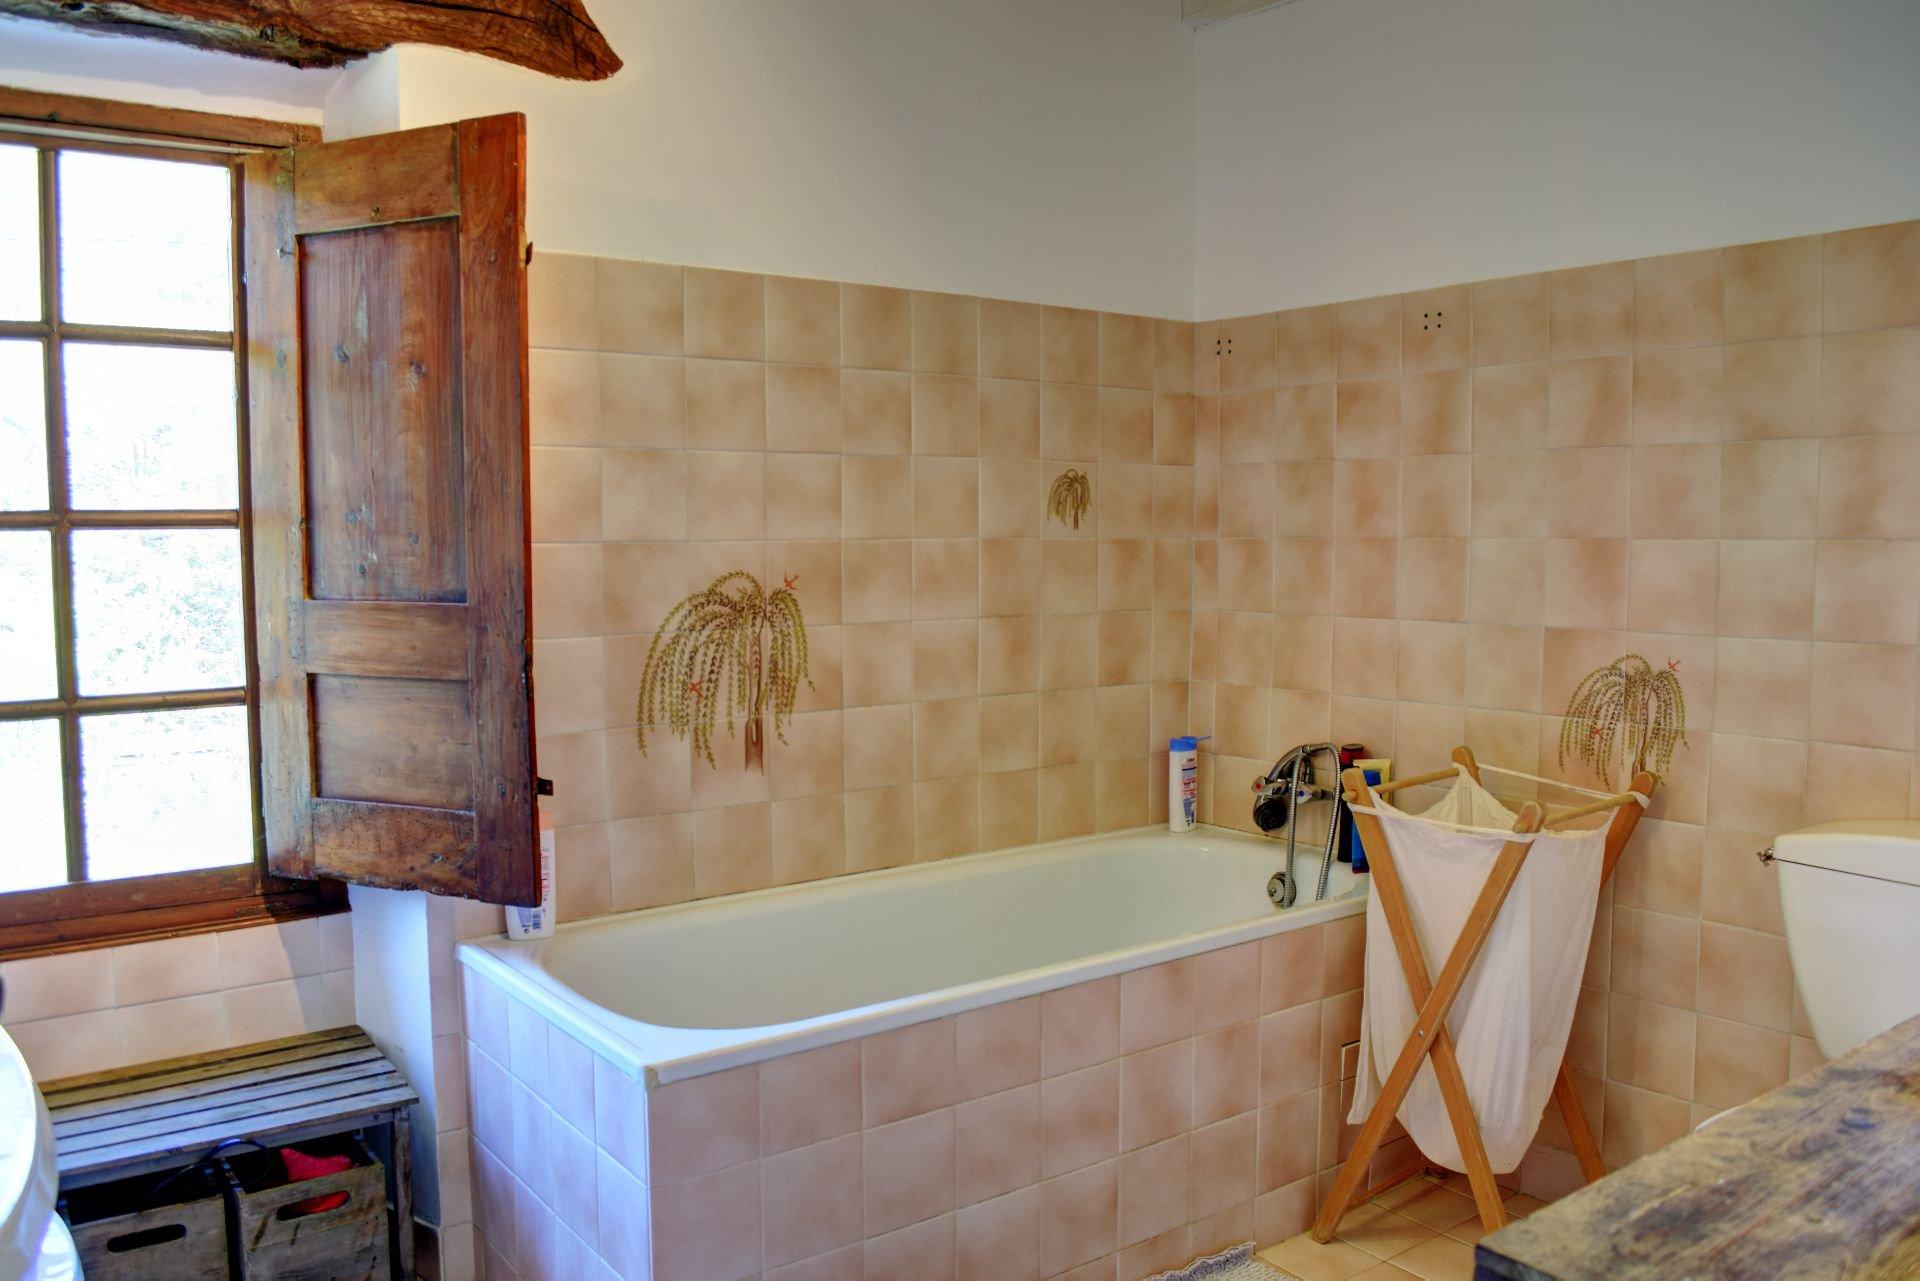 Bathroom, Lorgues Var Provence